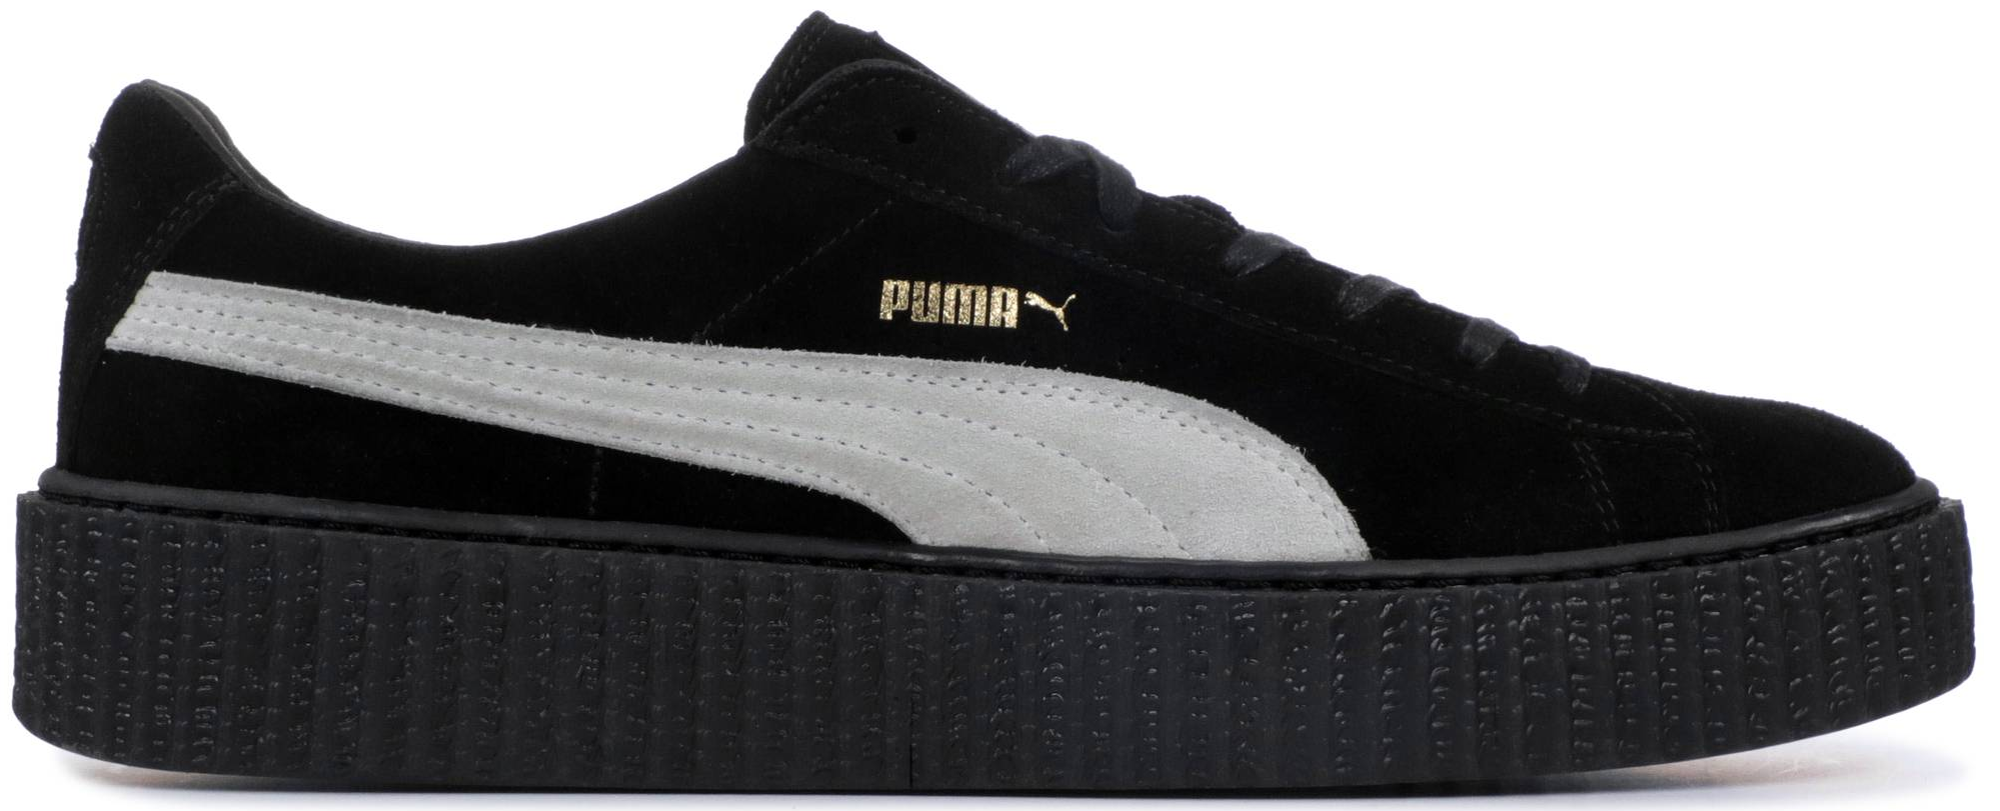 Puma Suede Creepers Fenty Rihanna Black